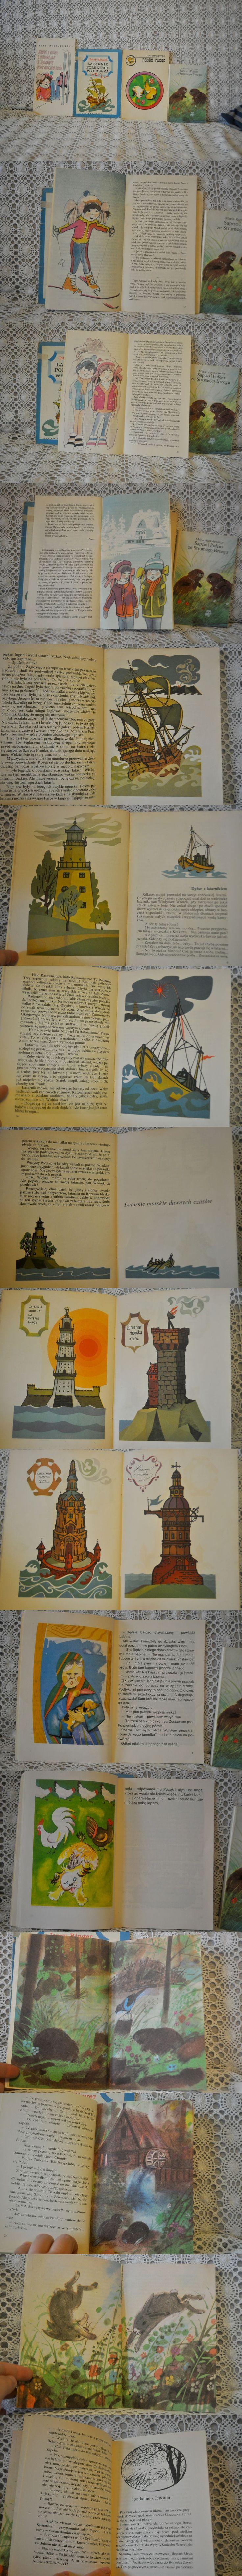 książki z lat '80